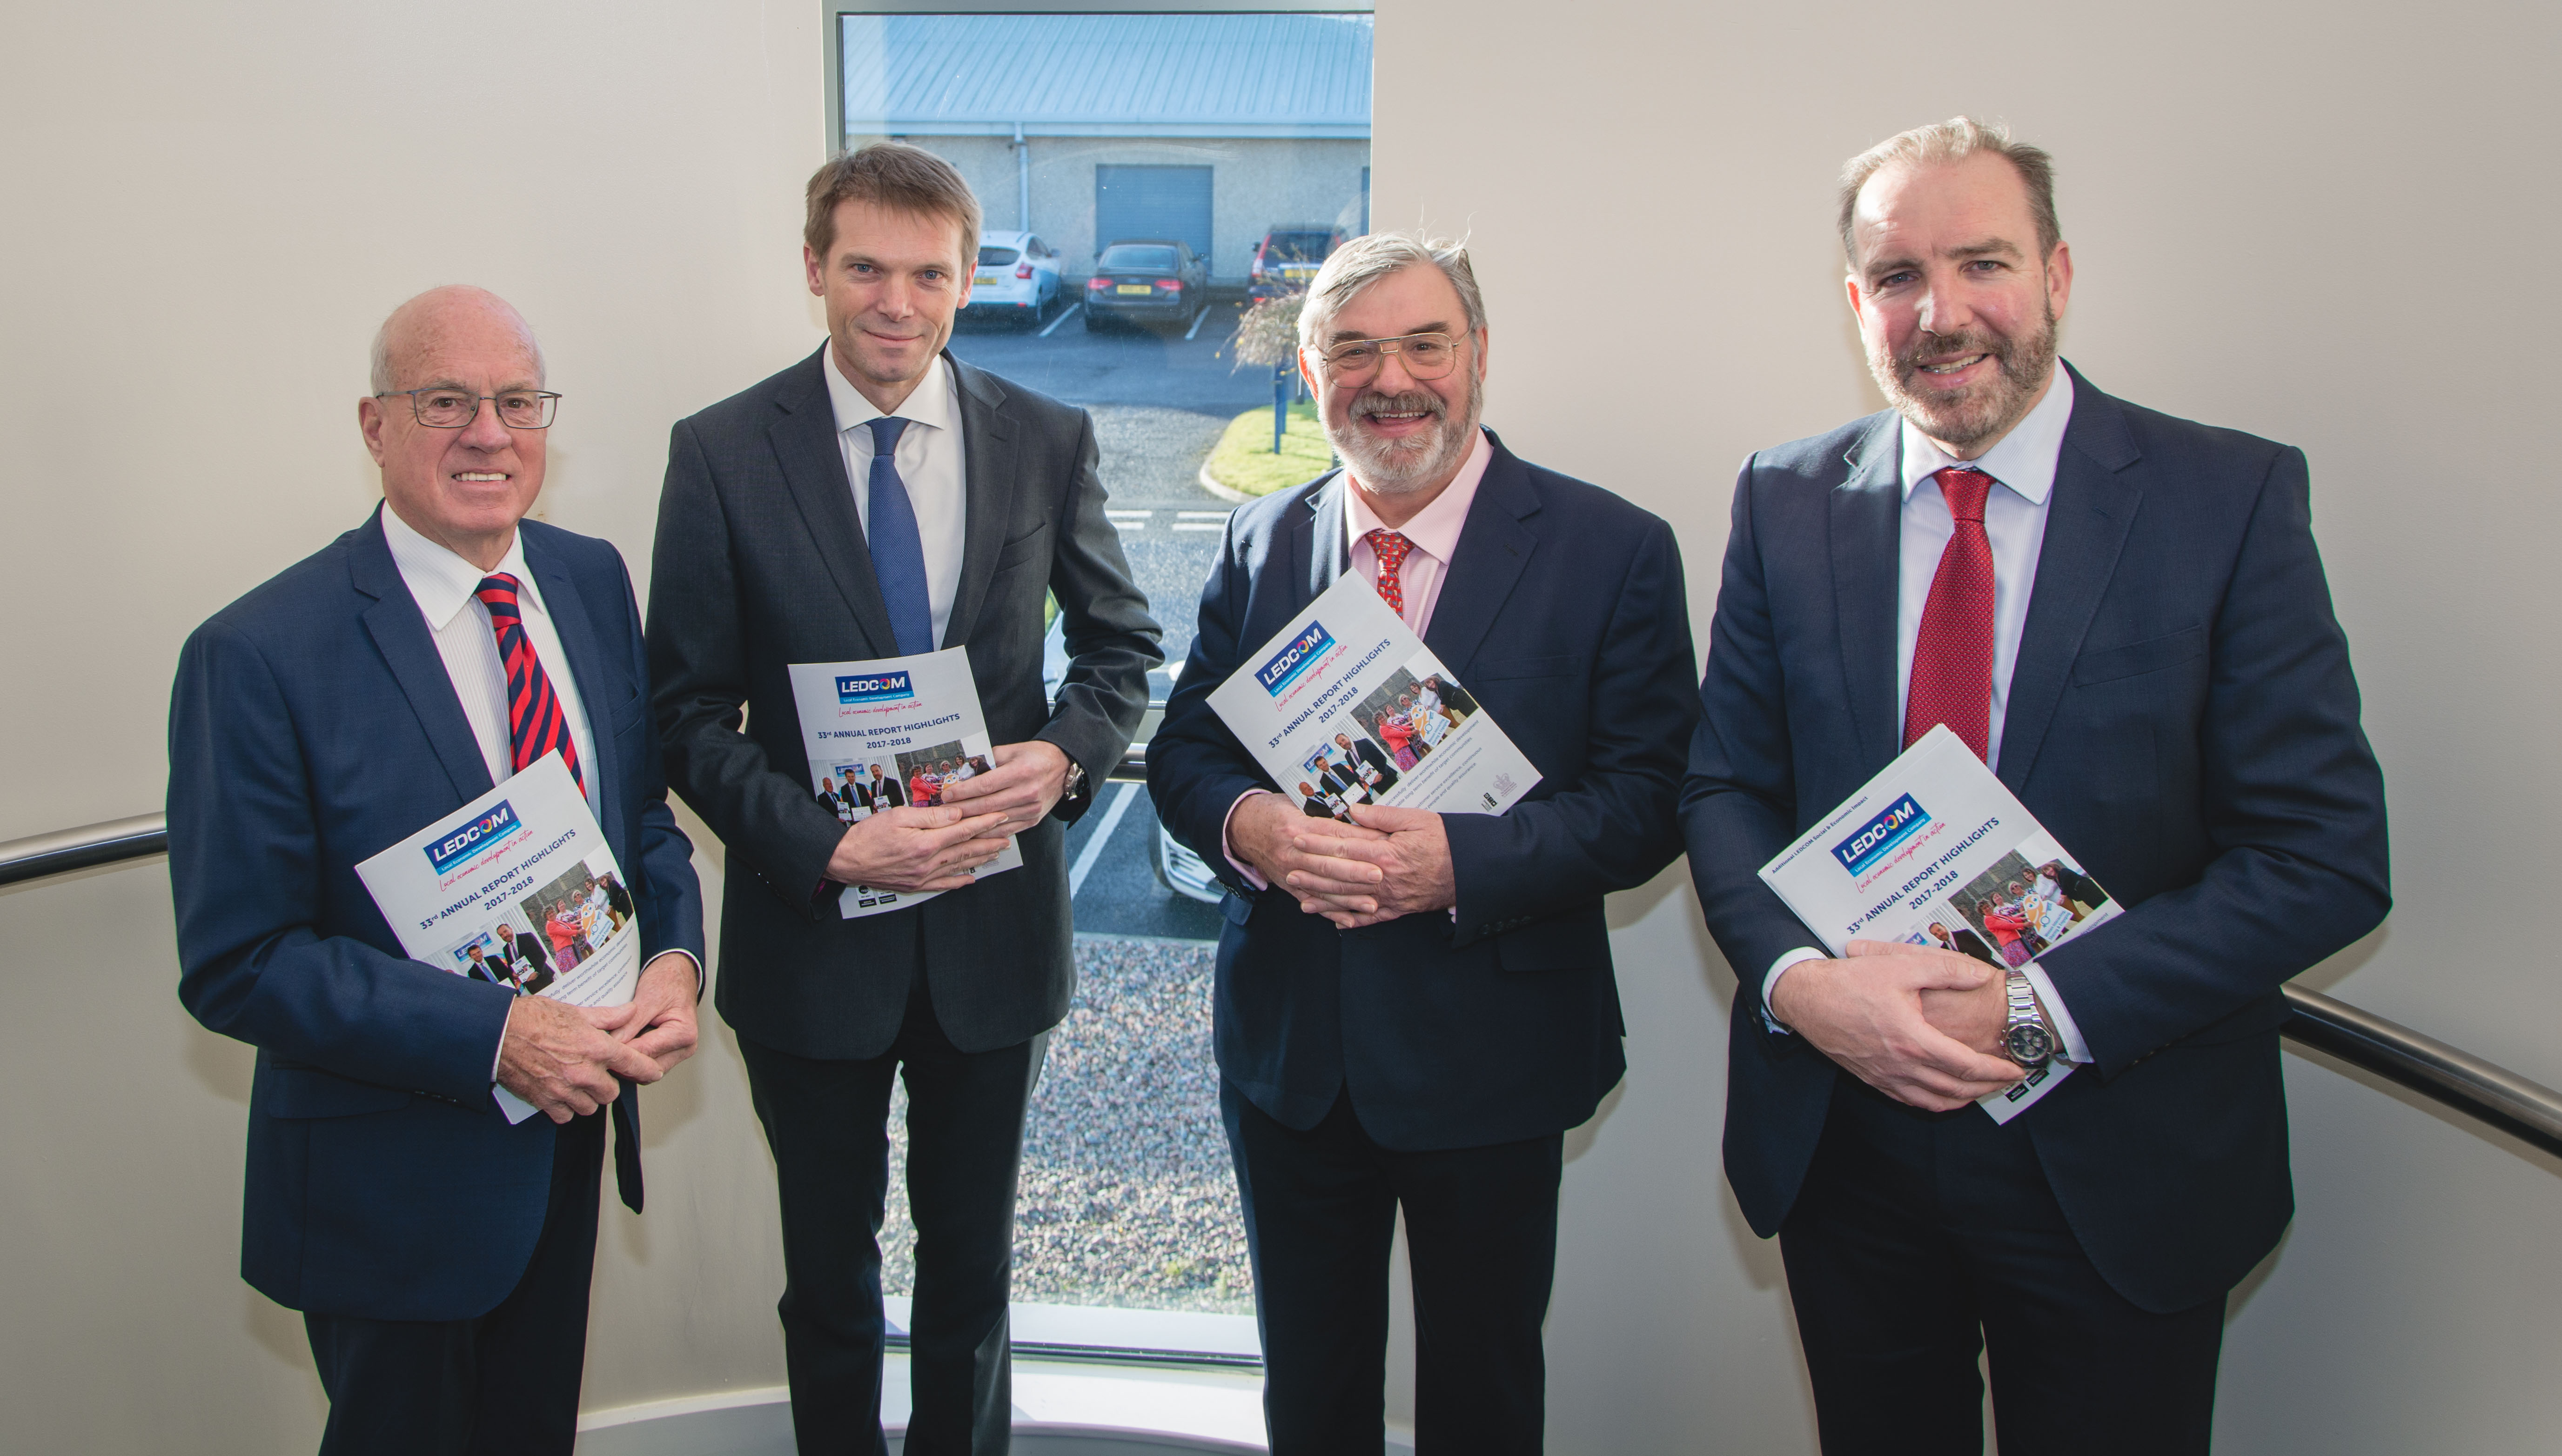 LEDCOM helps create 235 new jobs in 2018